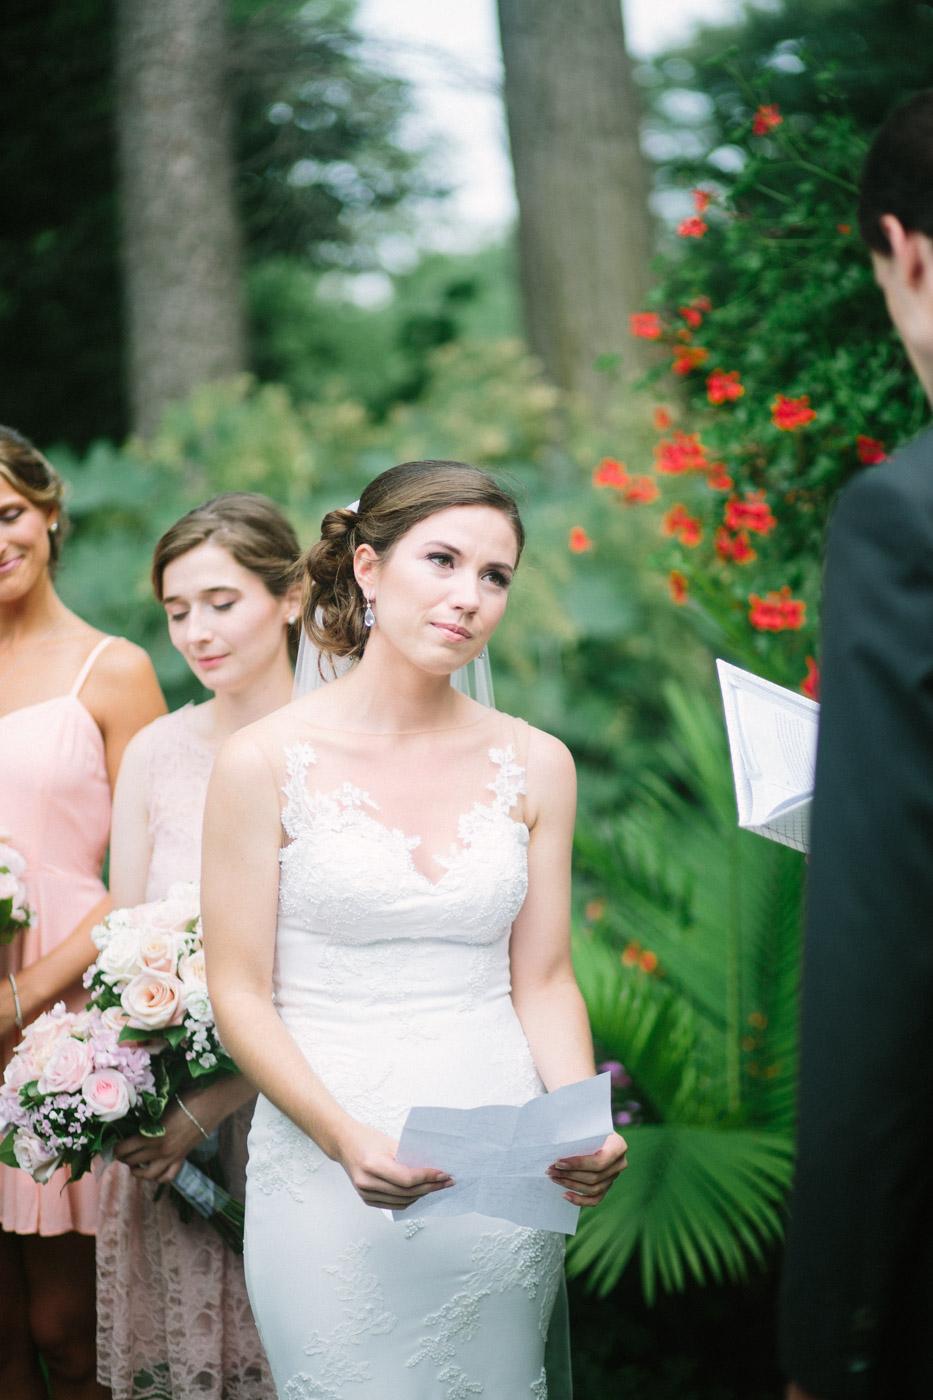 Kelly & Ben Wedding Web 2016-144.jpg